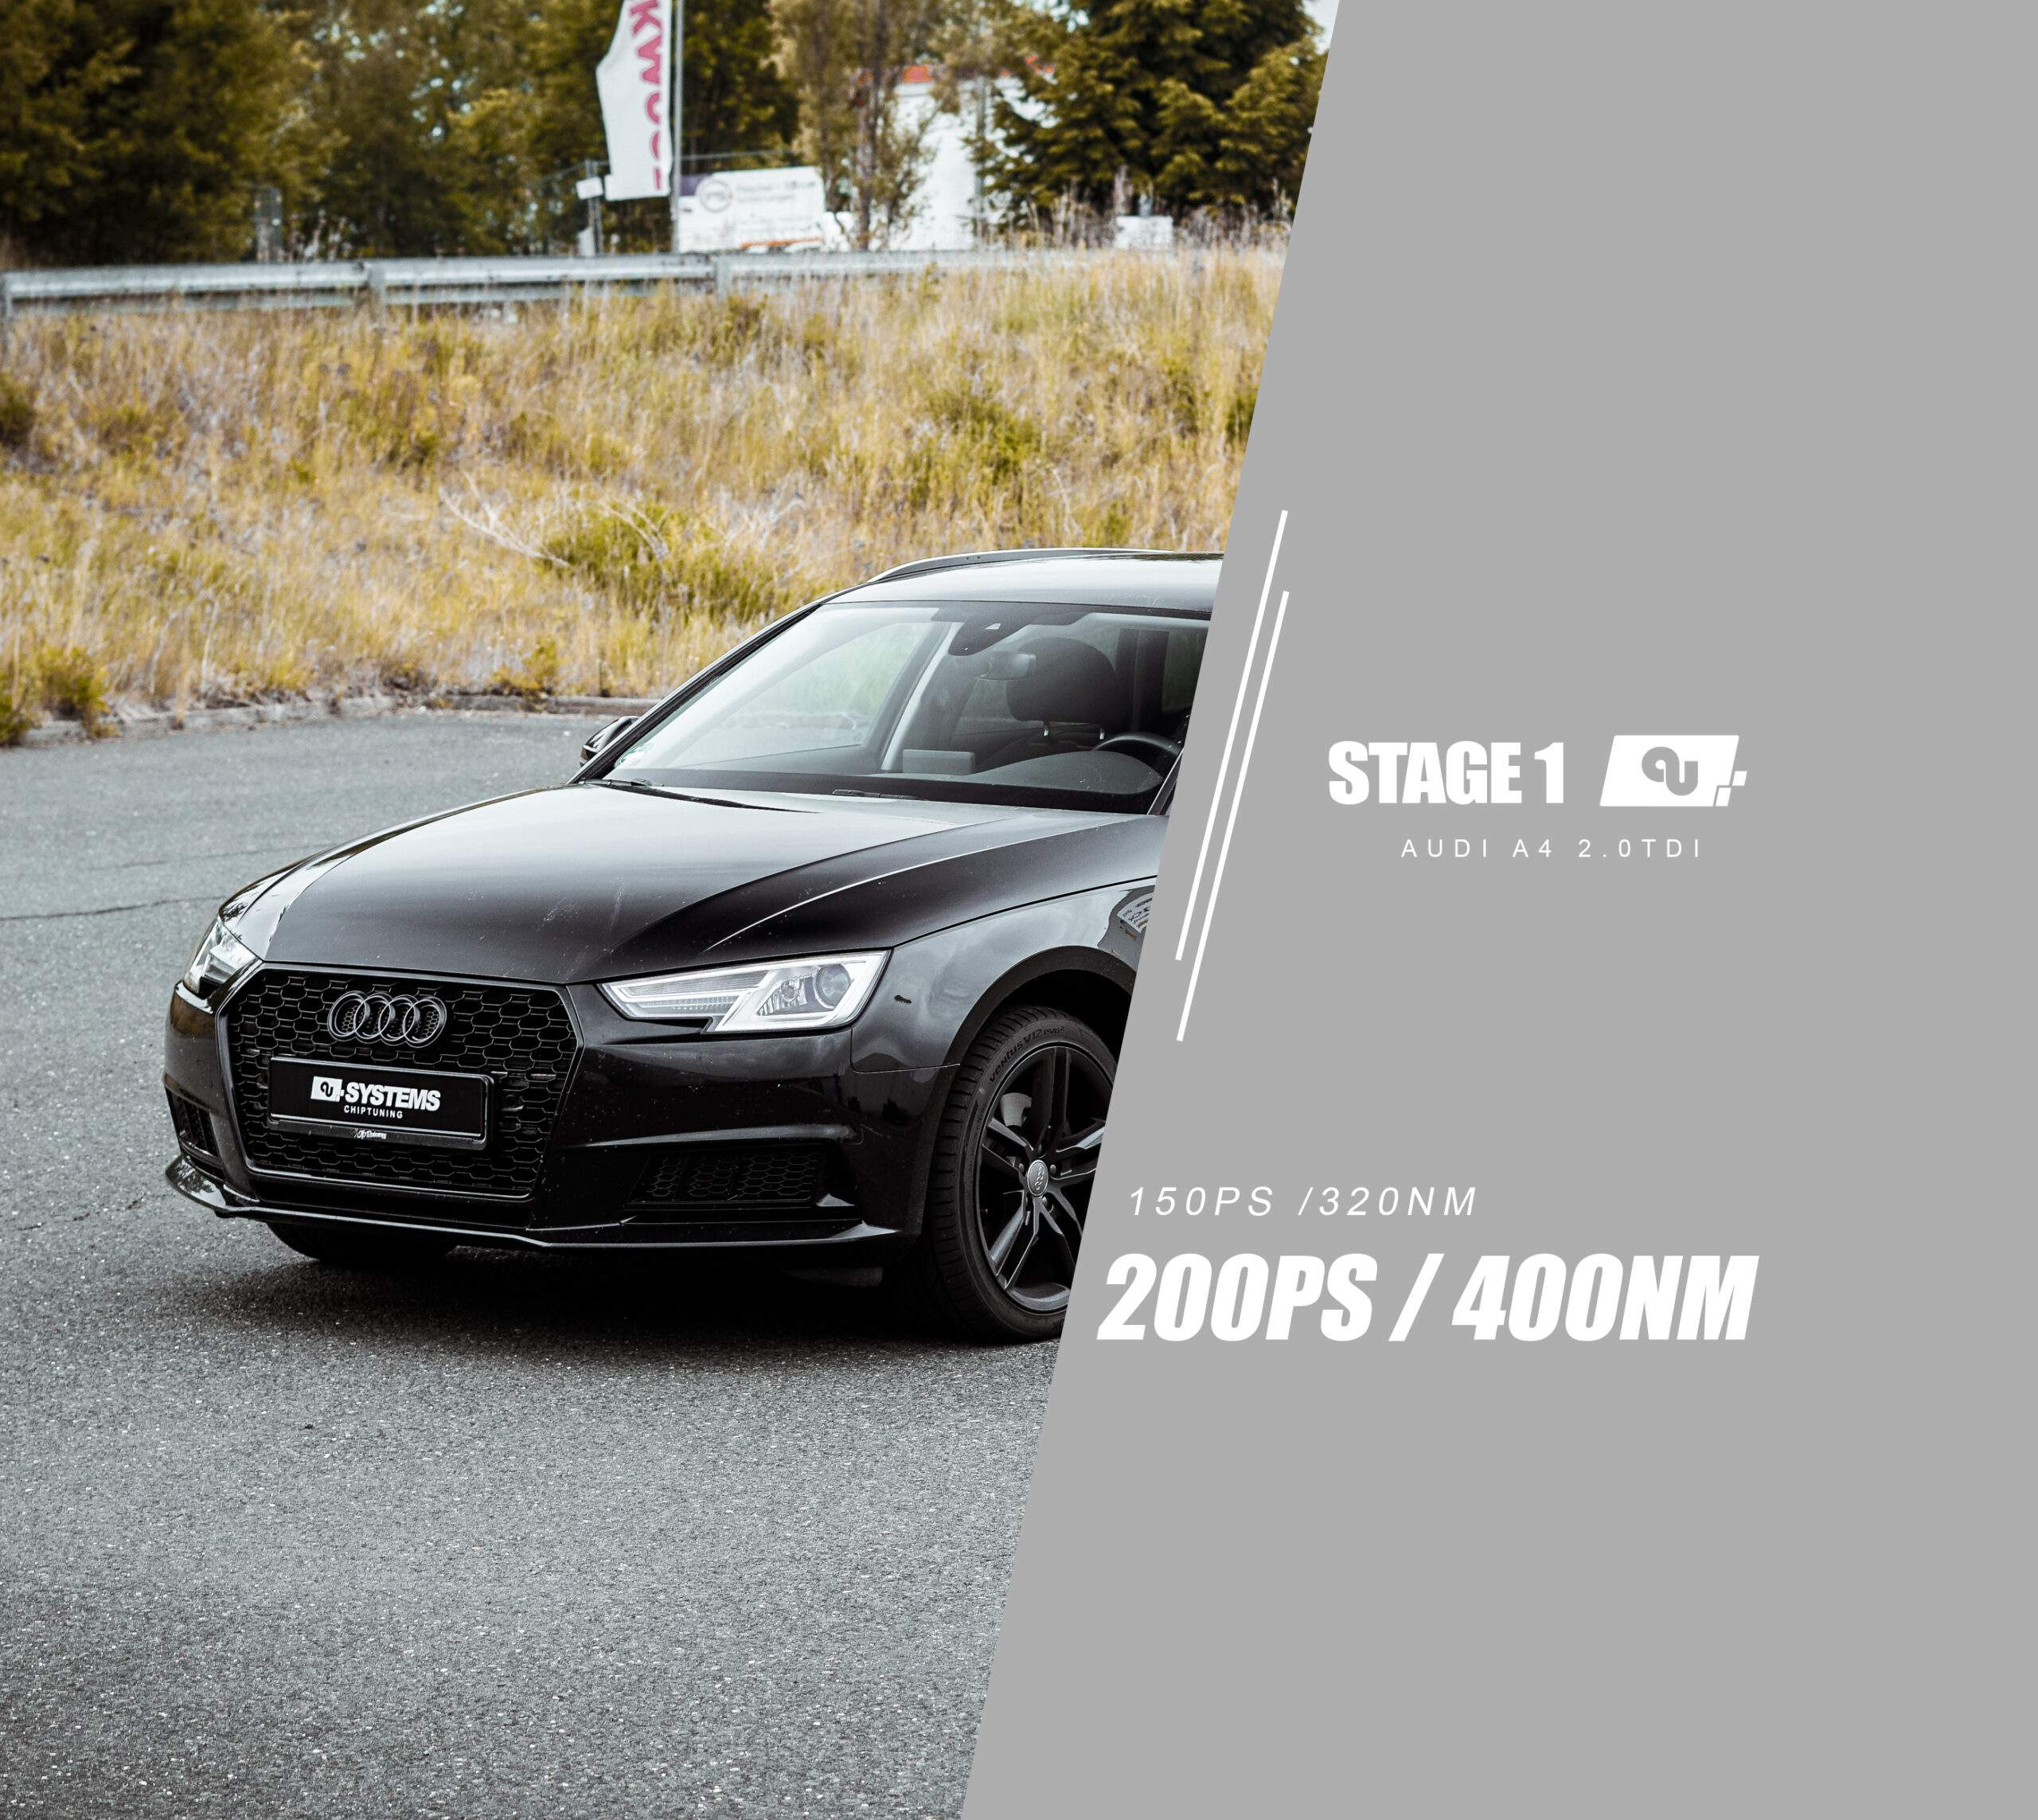 Stage 1 Optimierung Audi A4 B9 2.0TDI